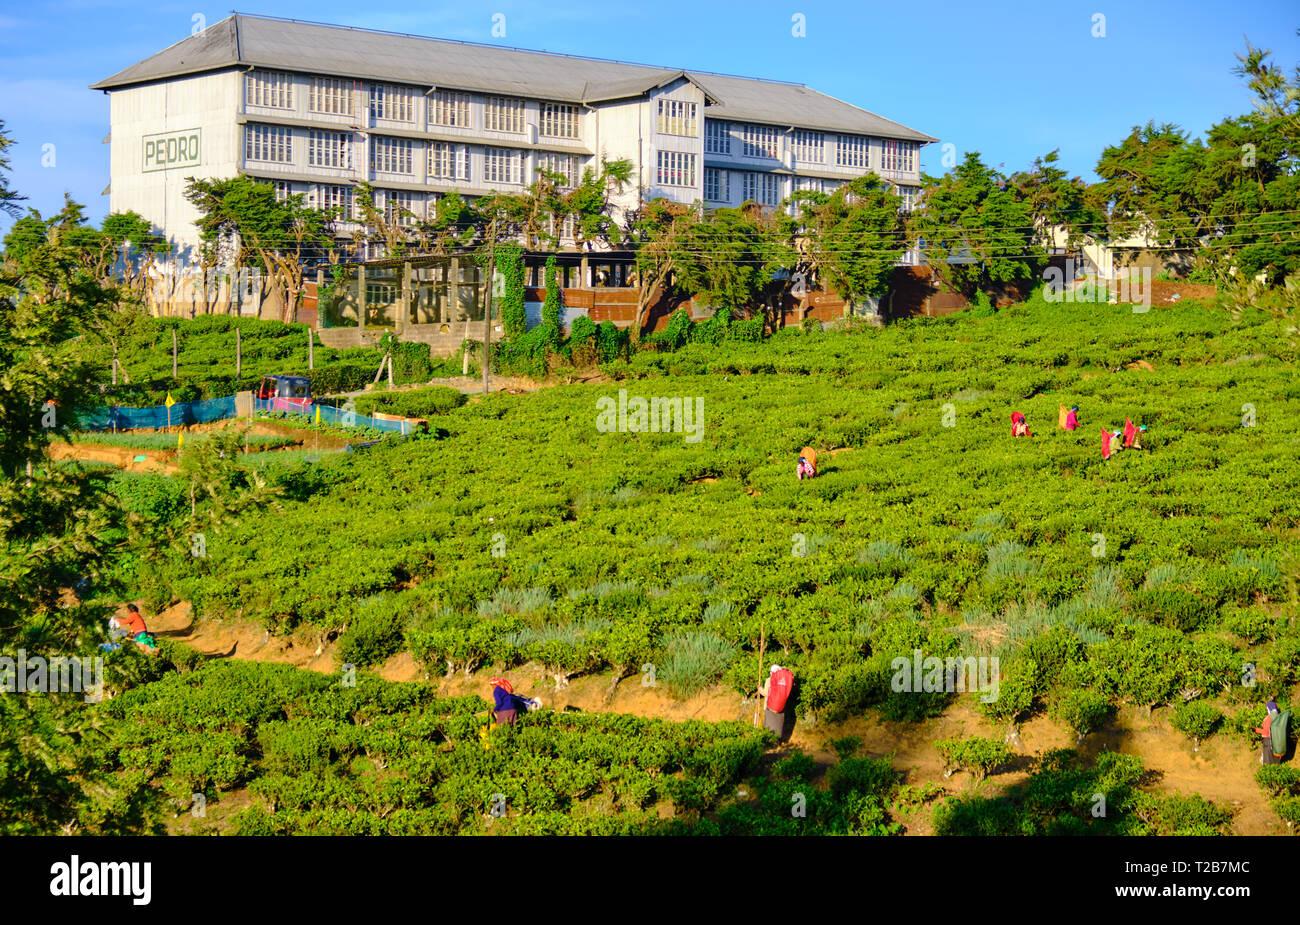 Pedro tea plantation with fields of tea plants and pickers on sunny day.  Nuwara Eliya, Sri Lanka Stock Photo